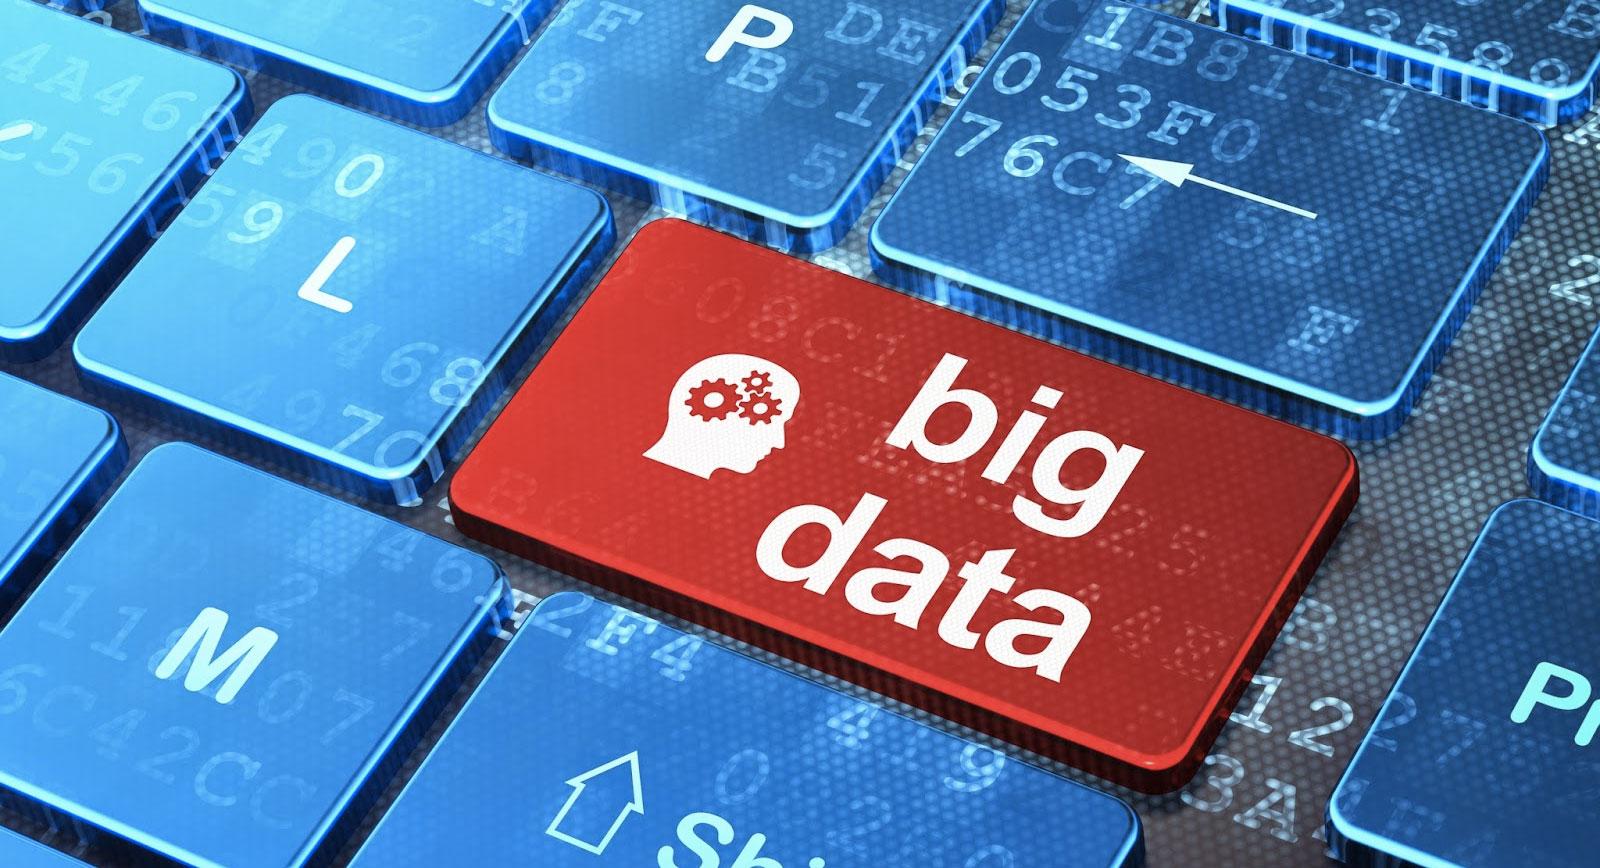 BigData - Economia digitale, Big Data: Agcom, Antitrust e Garante privacy avviano indagine conoscitiva